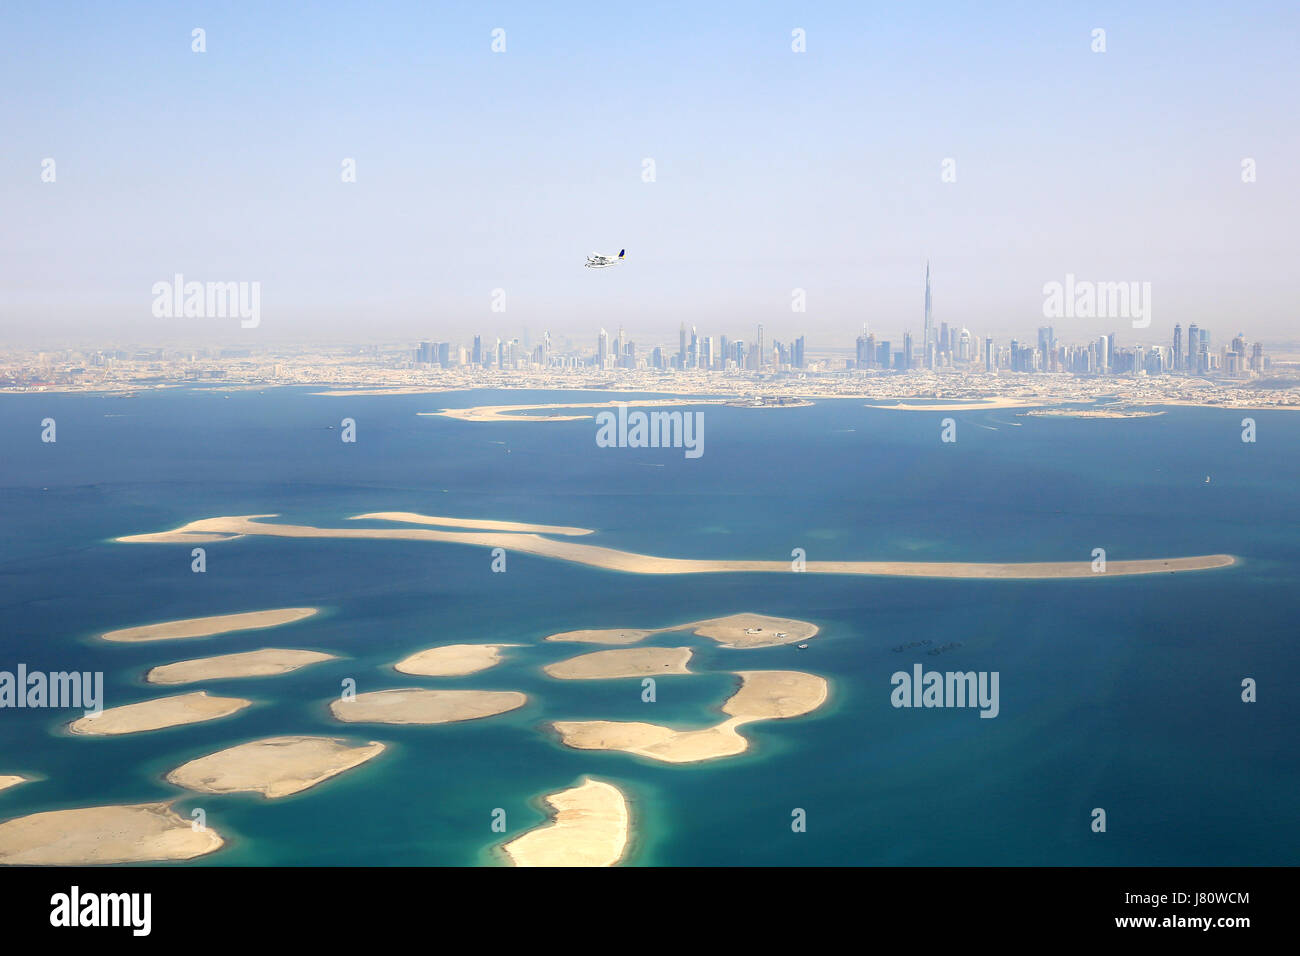 Dubai The World Islands Island Burj Khalifa aerial view photography UAE - Stock Image